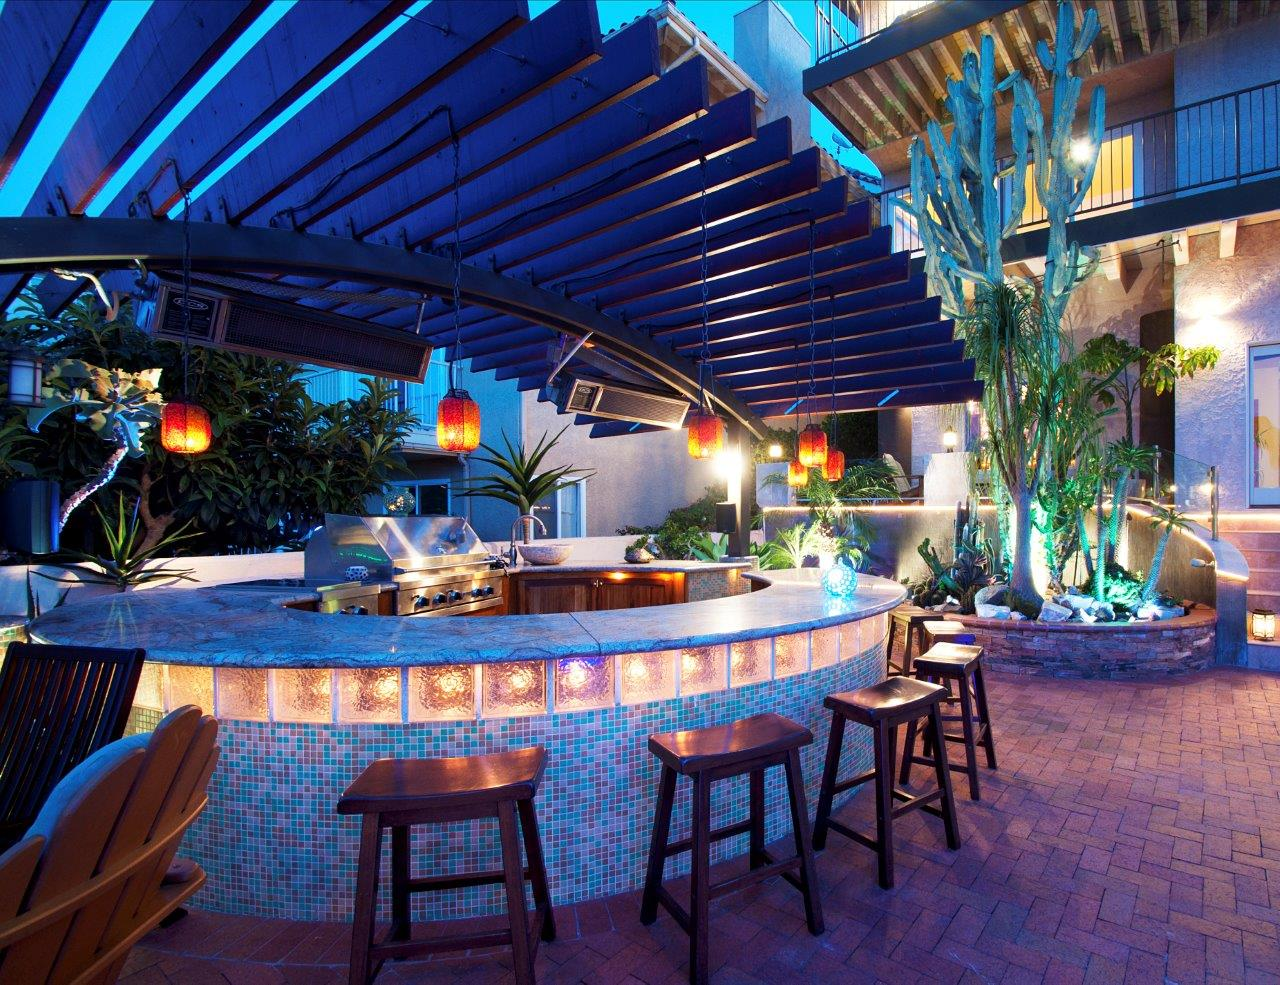 3819-Paseo-De-Las-Tortugas-backyard-night-shot10